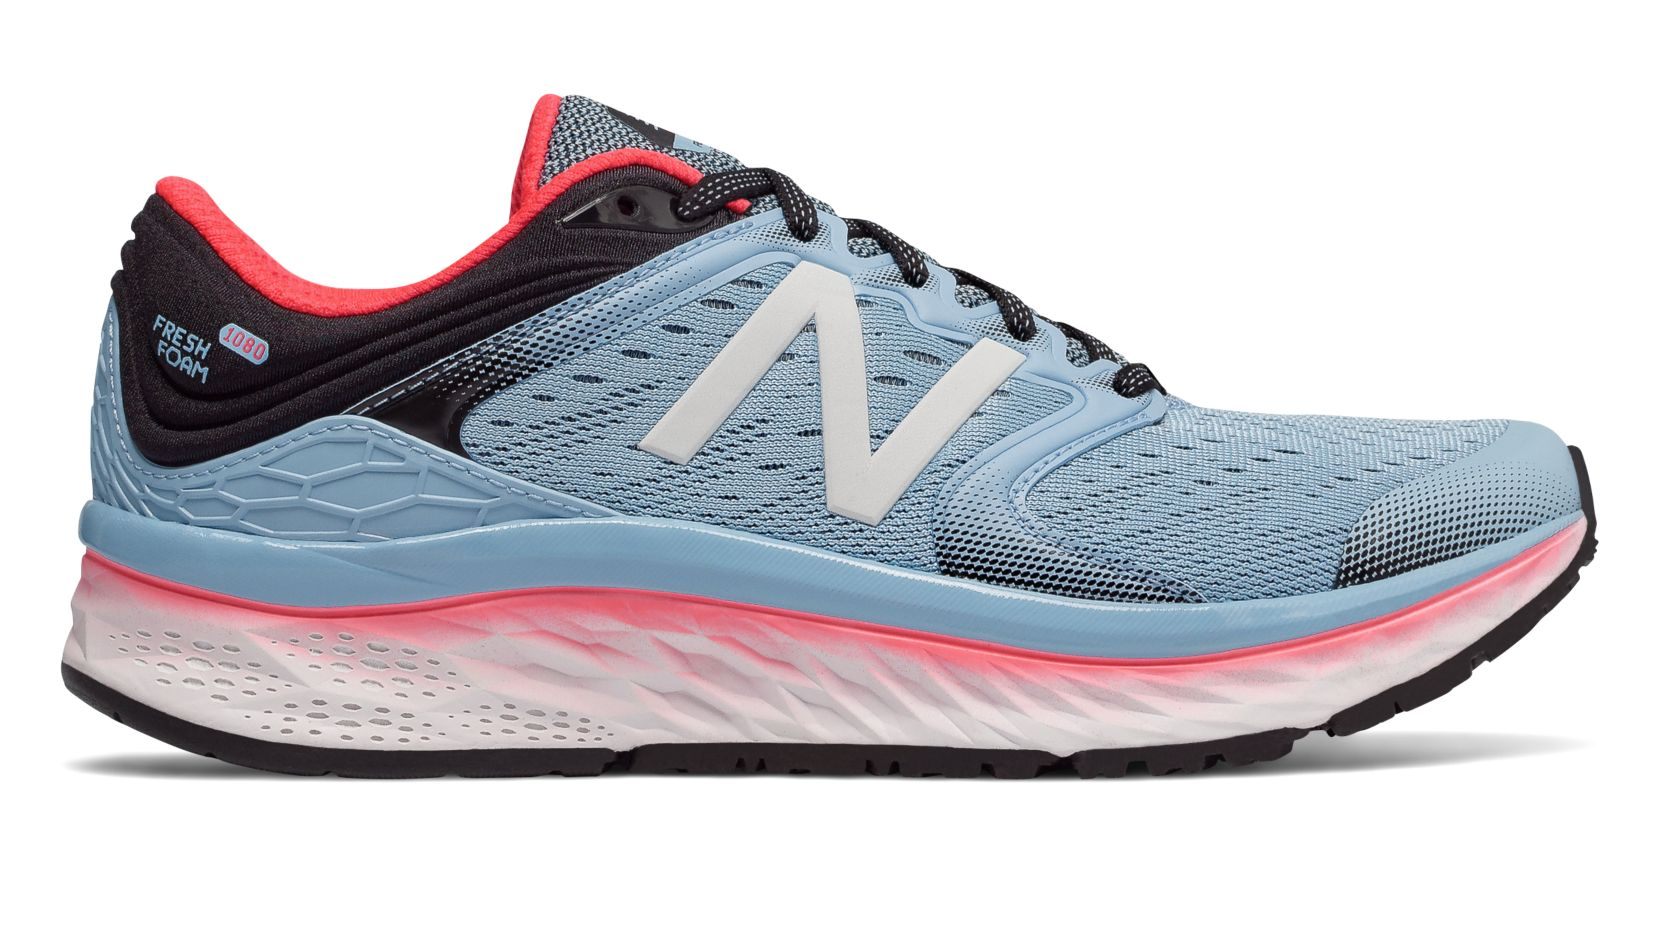 1b4d00f0800 Details about New Balance Fresh Foam 1080v8 Womens Running Shoes -  Sky Coral Black (D)